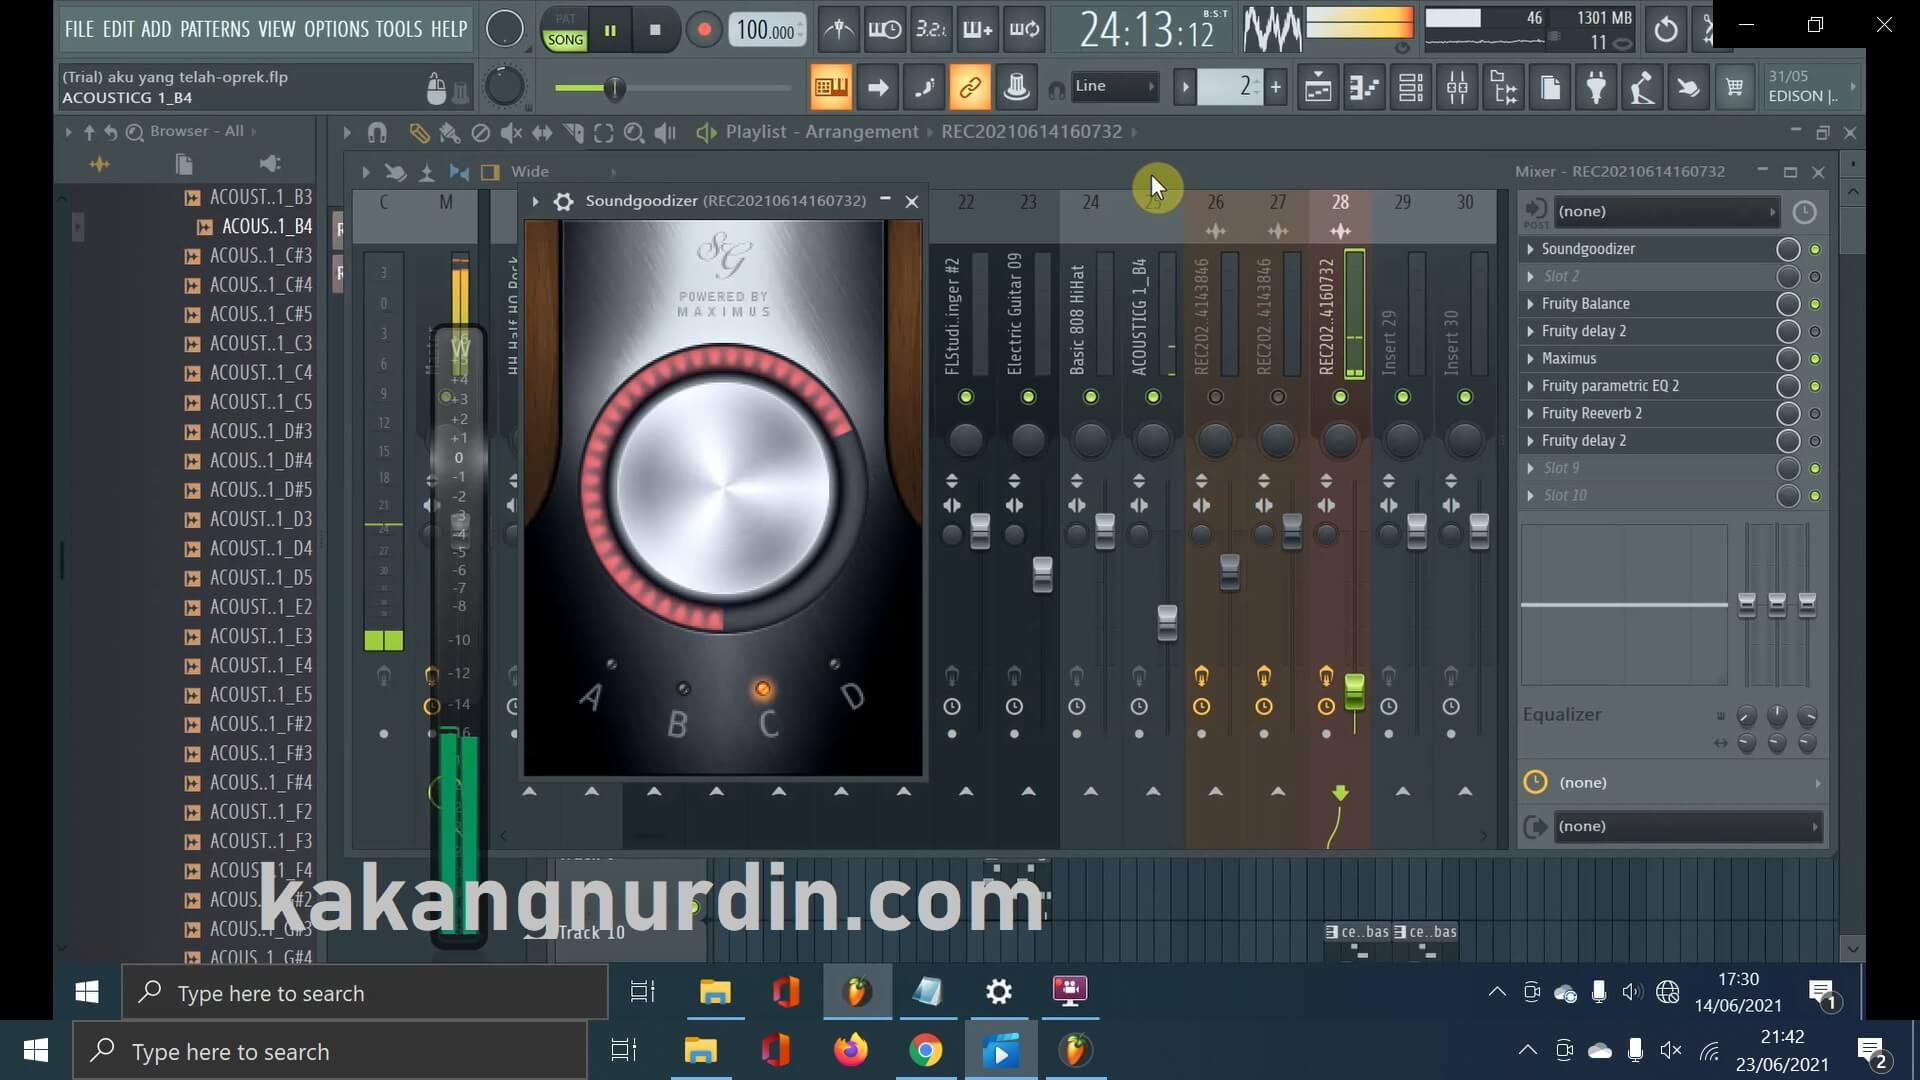 mastering volume fl studio 20 kakangnurdin.com